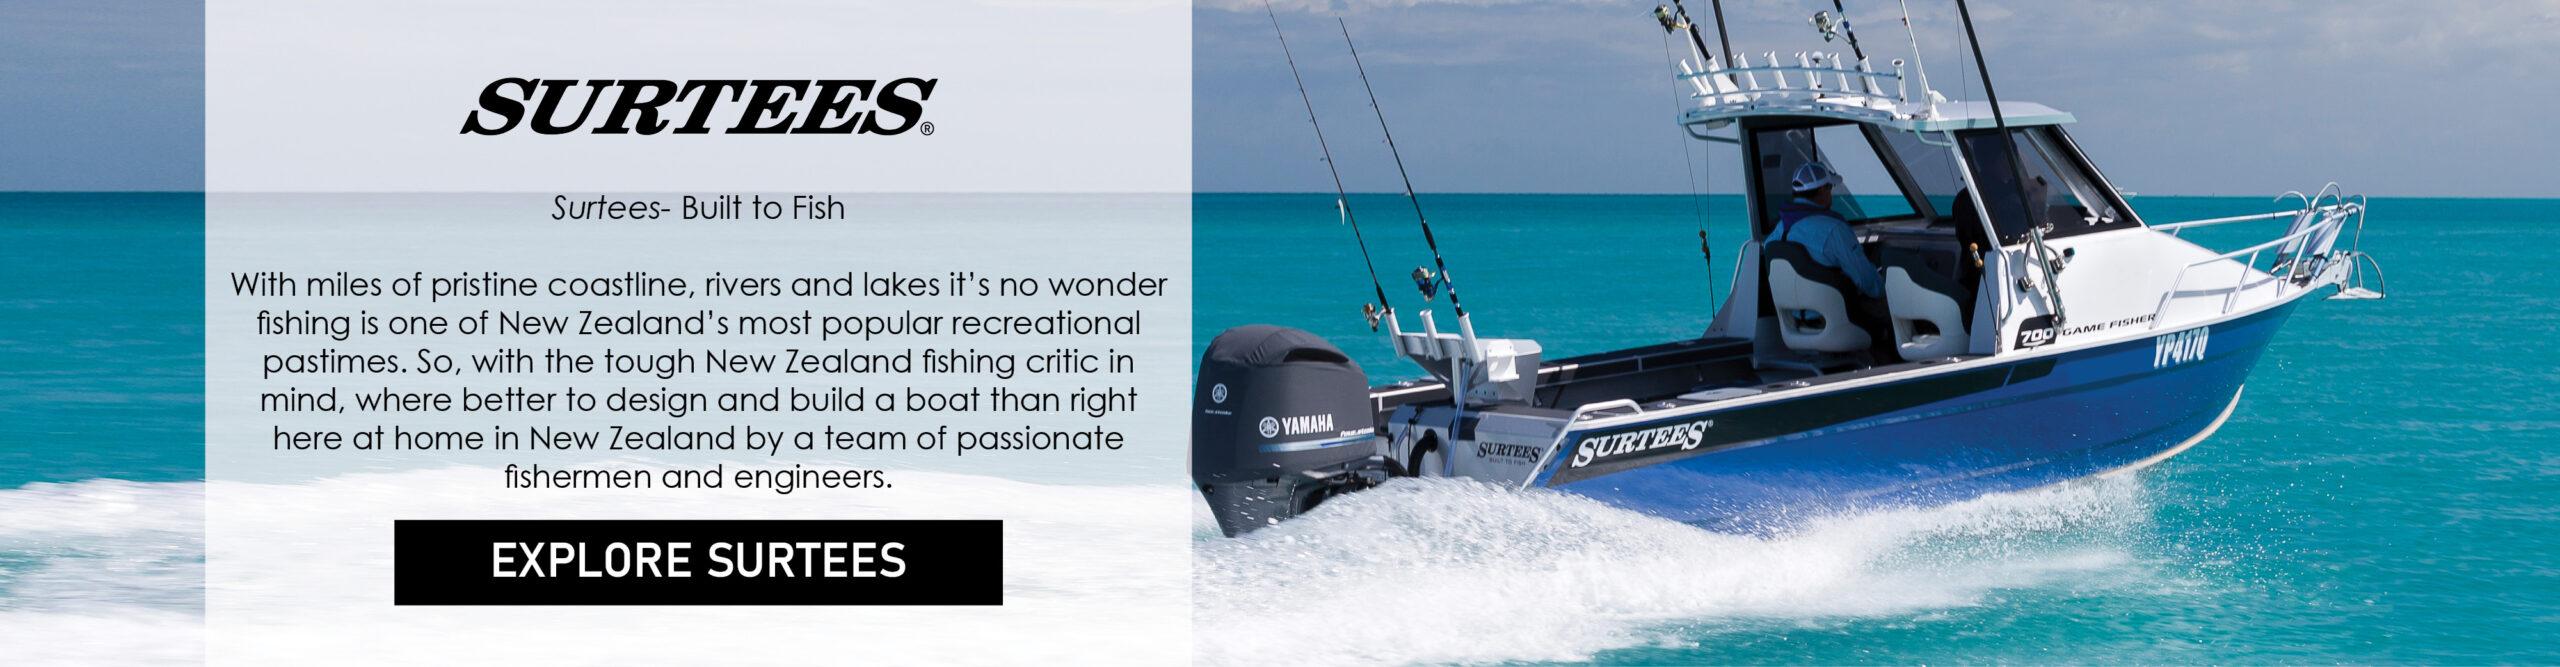 Surtees: Built to Fish!